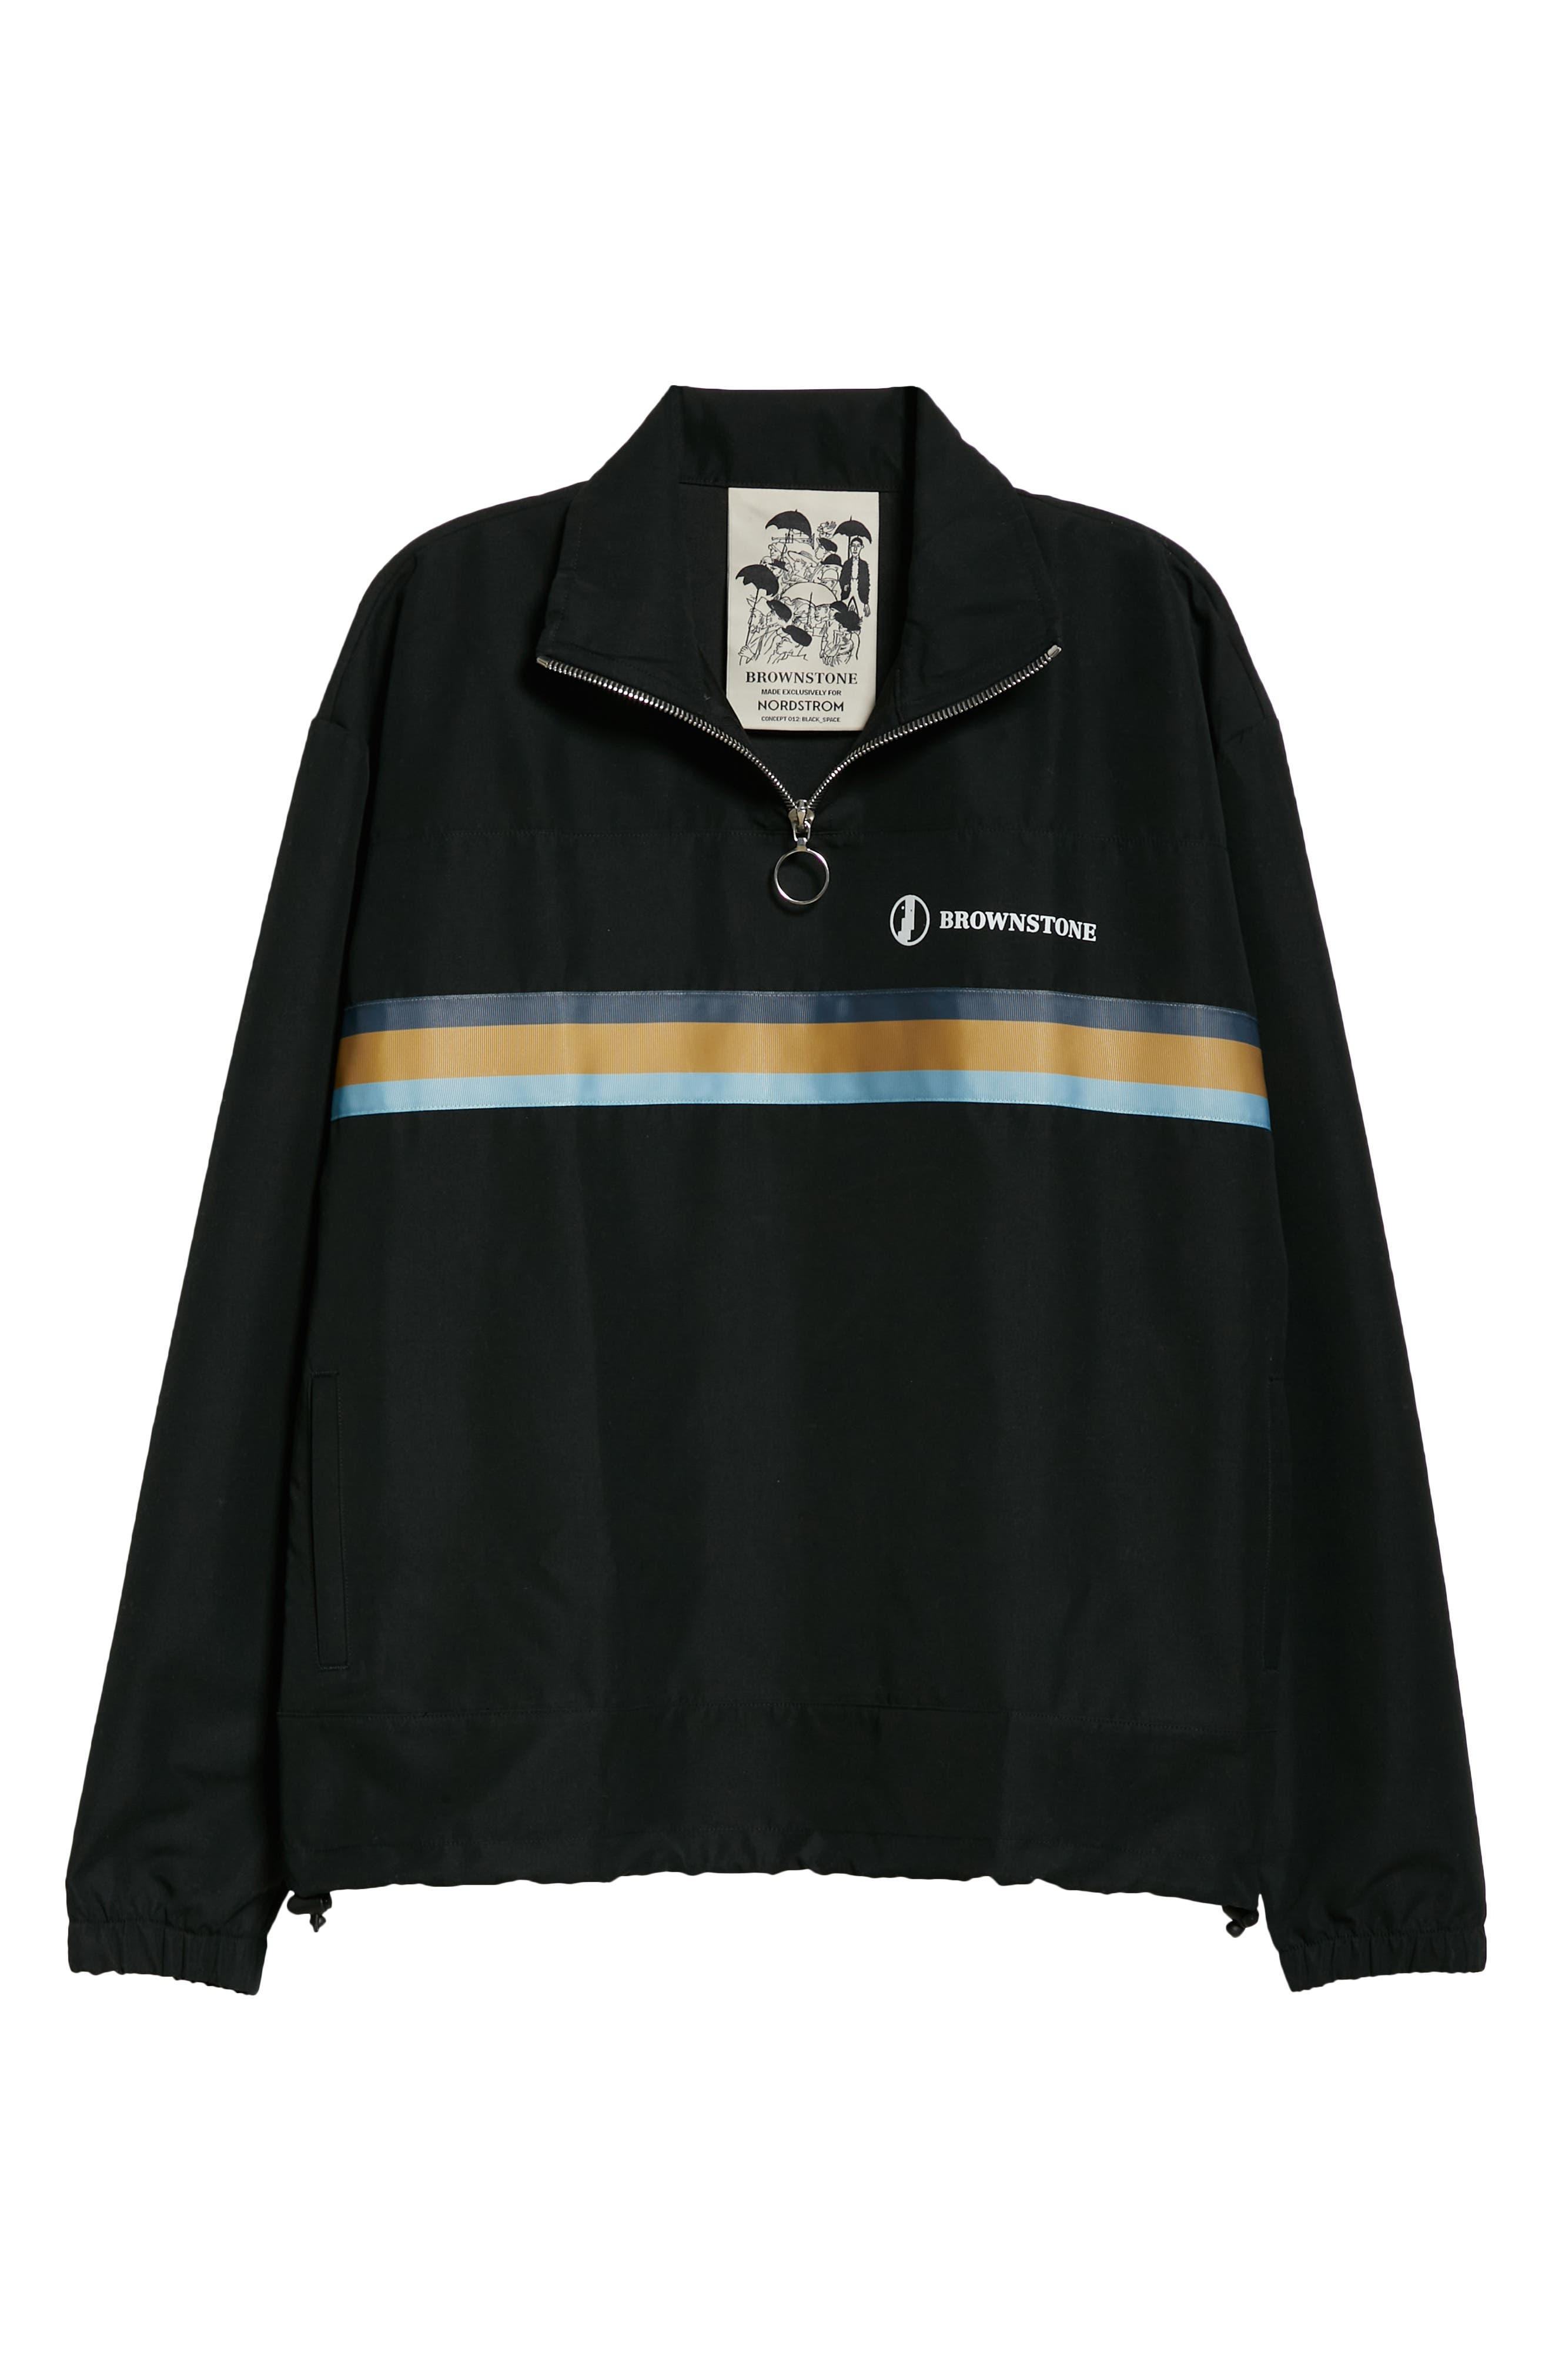 Brownstone Pullover Track Jacket